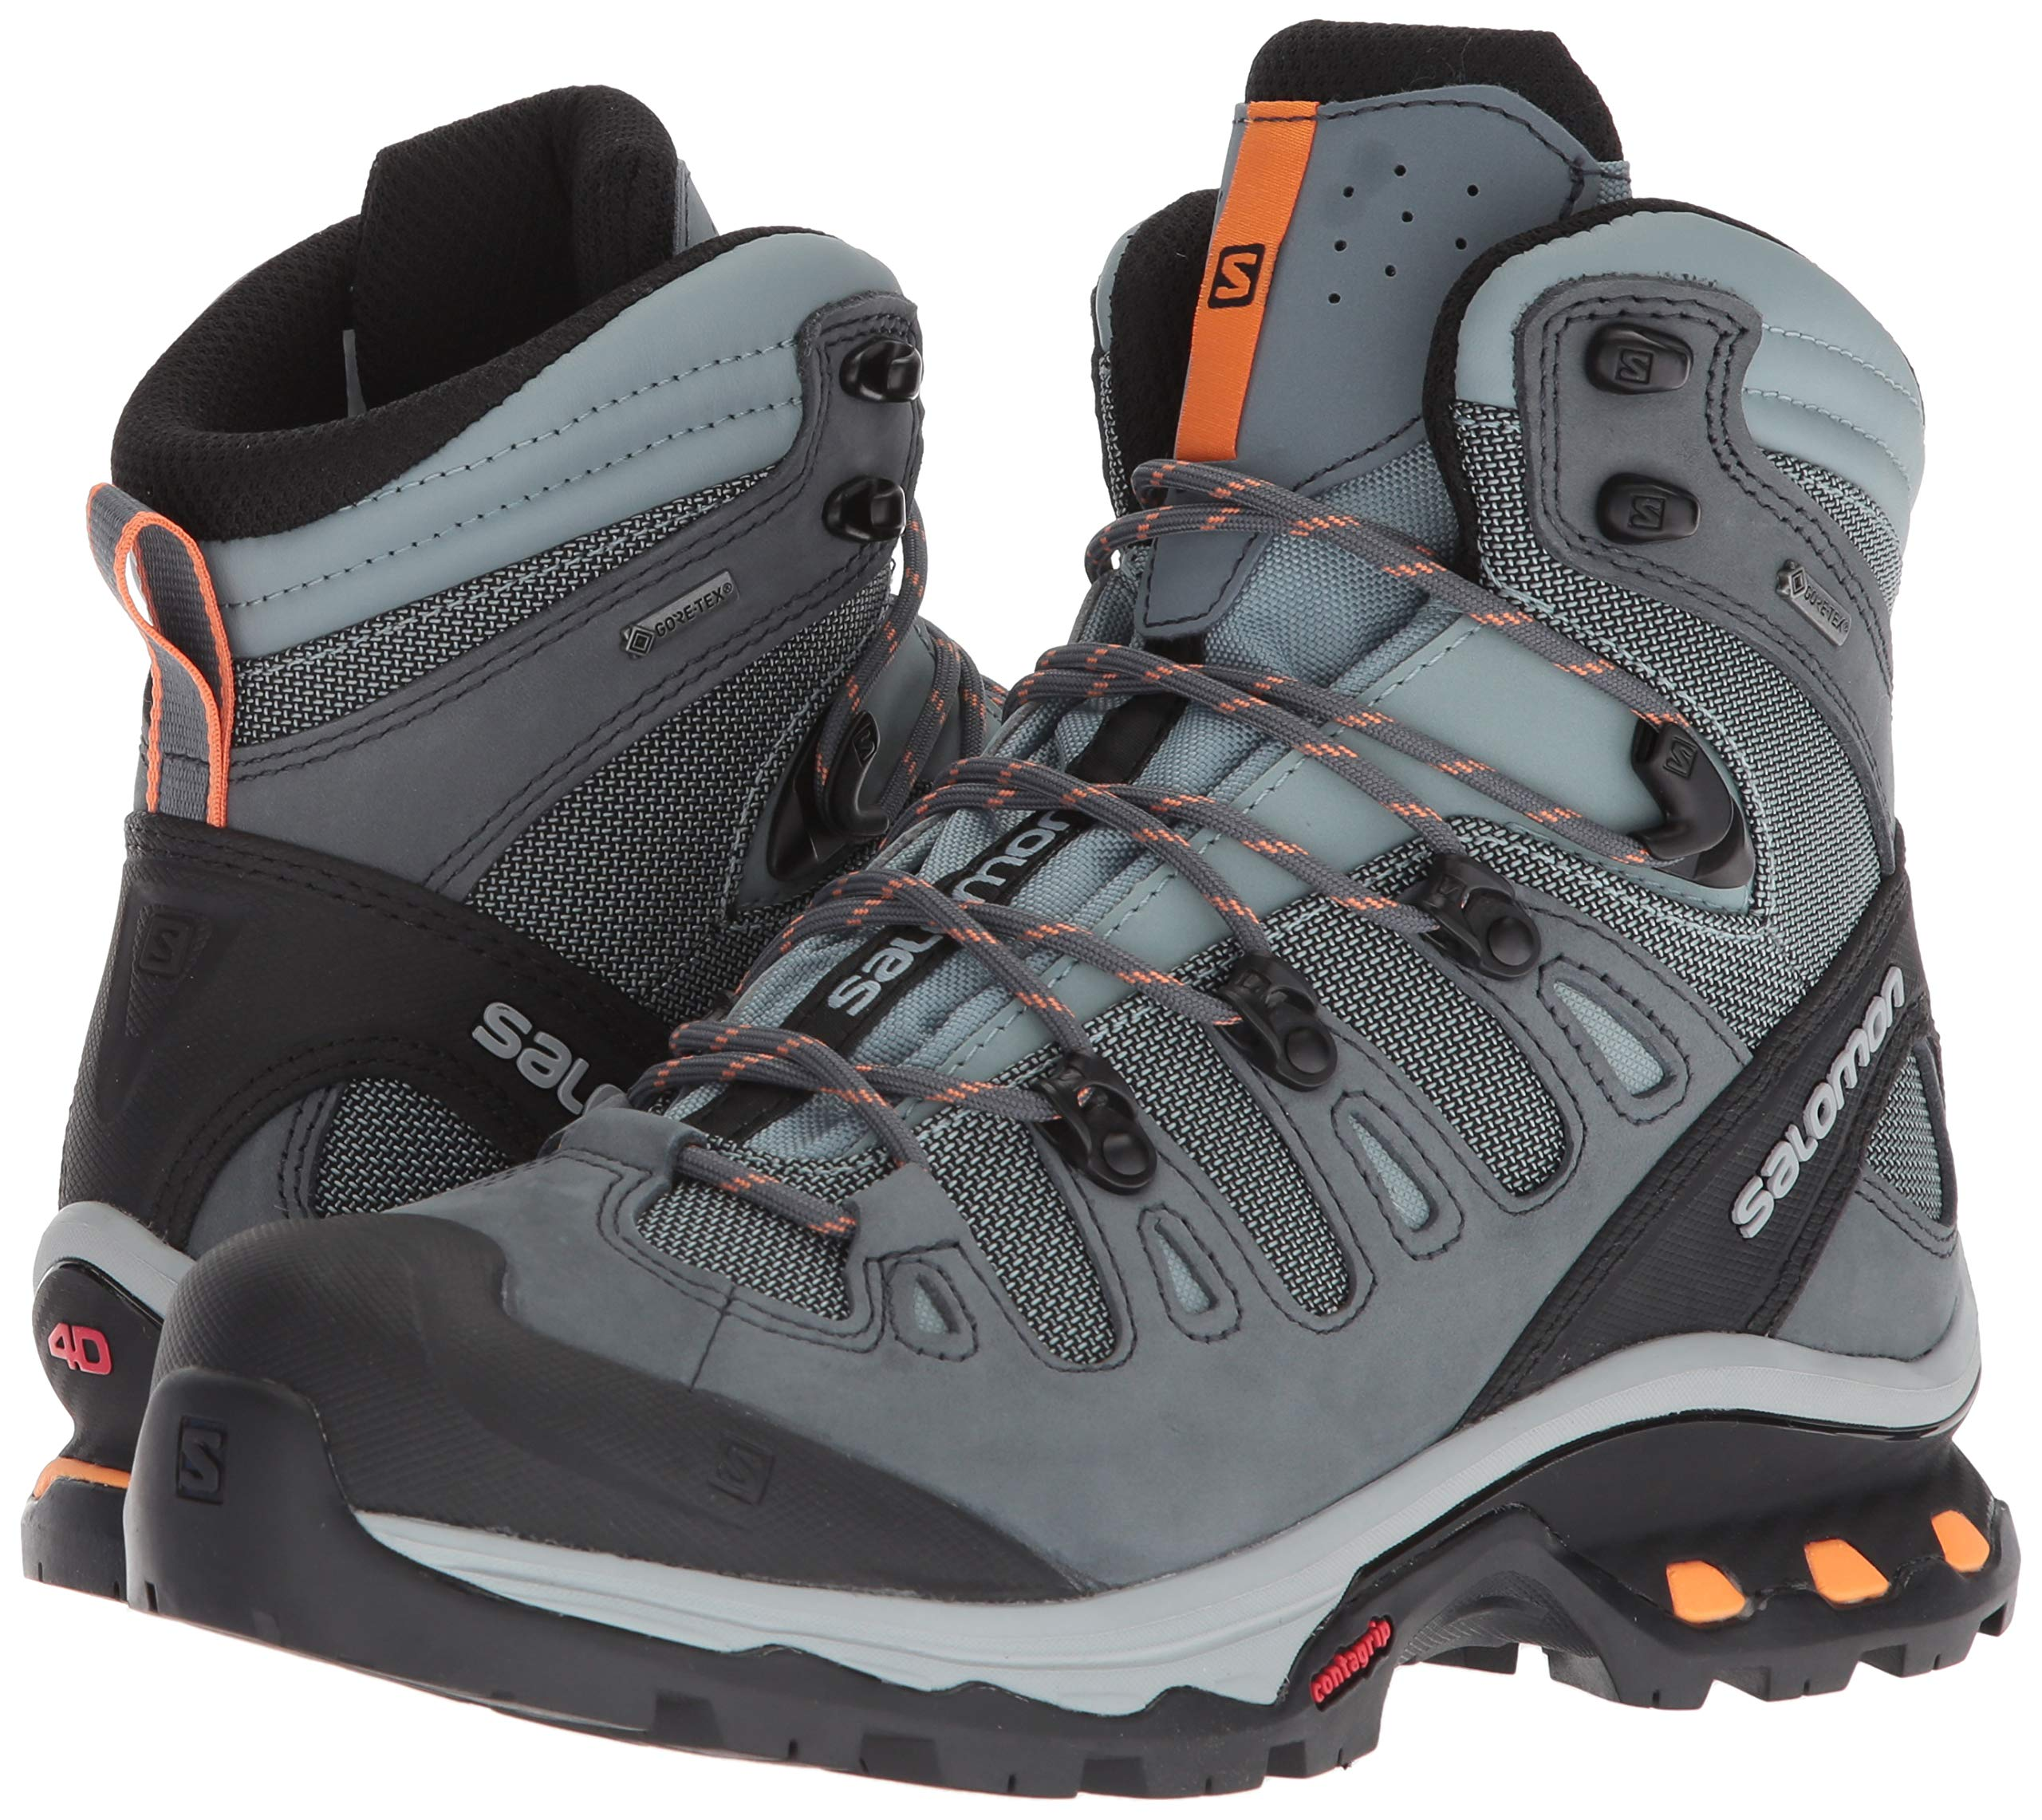 SALOMON Women's Quest 4d 3 GTX W High Rise Hiking Boots 6